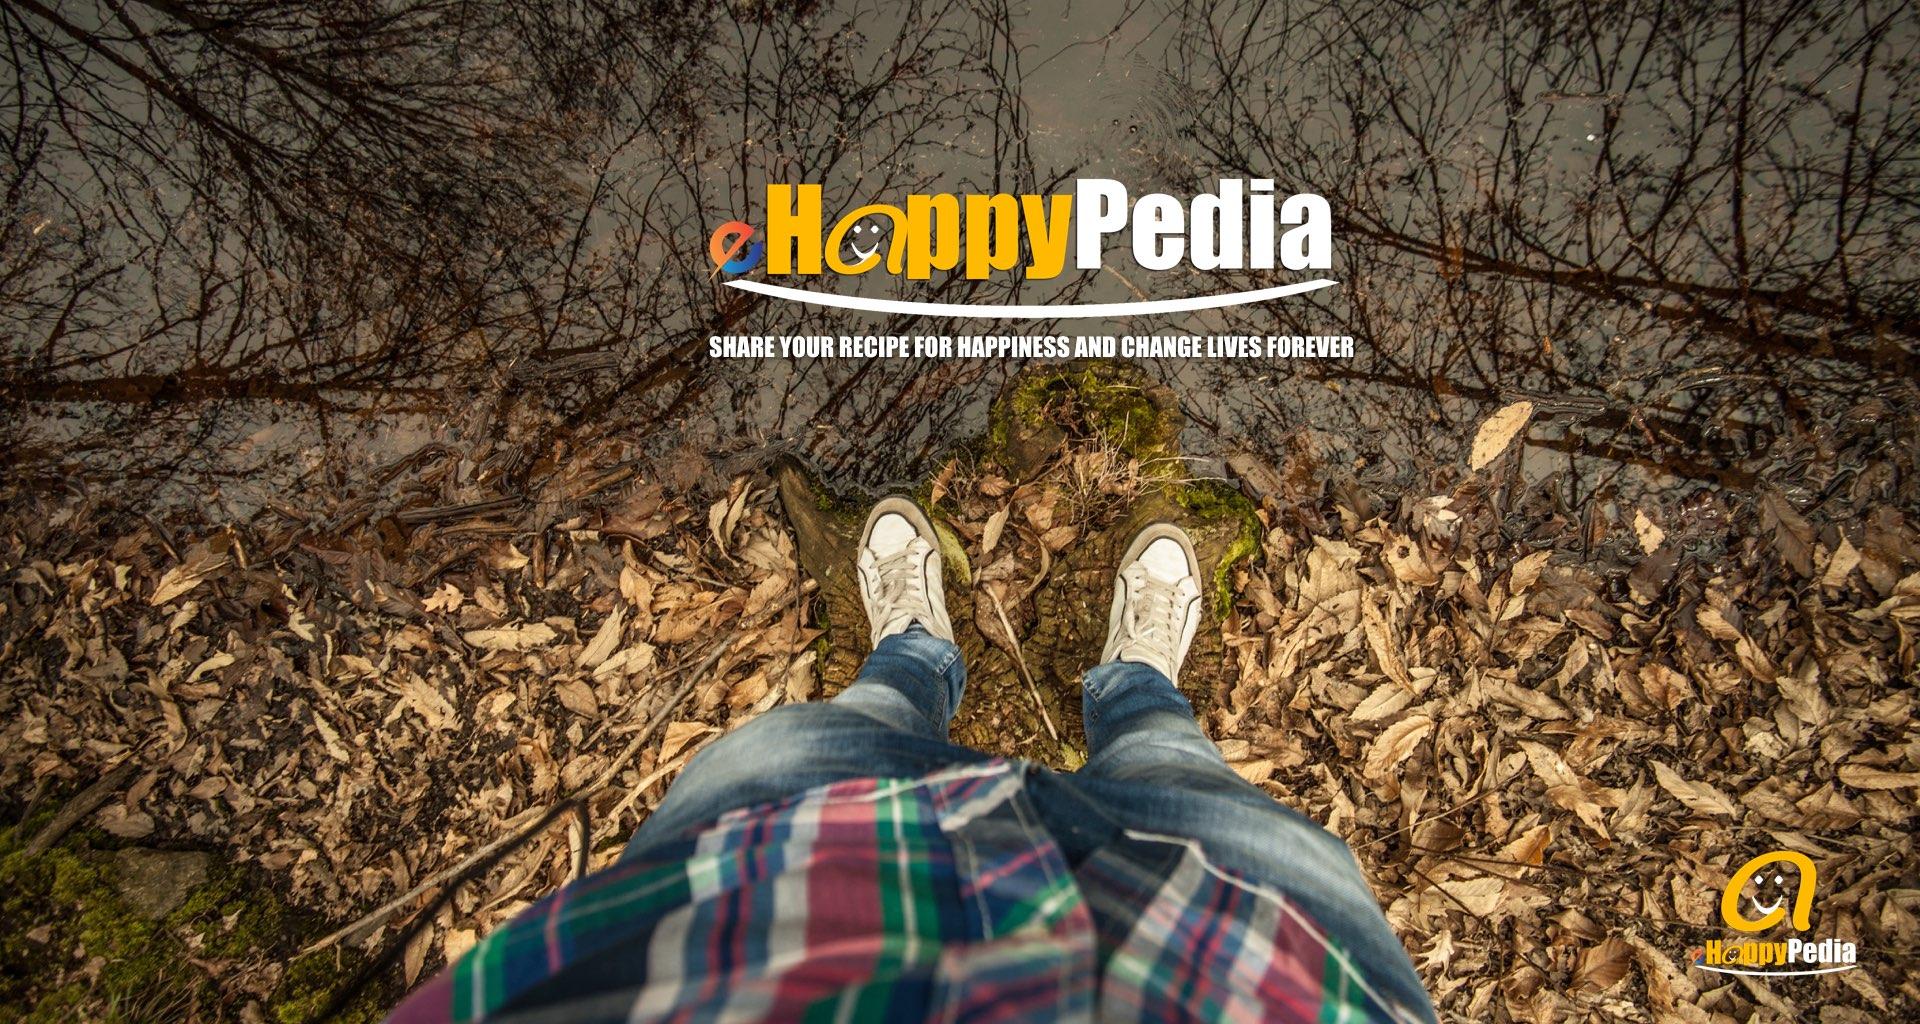 ehappypedia.105.jpeg